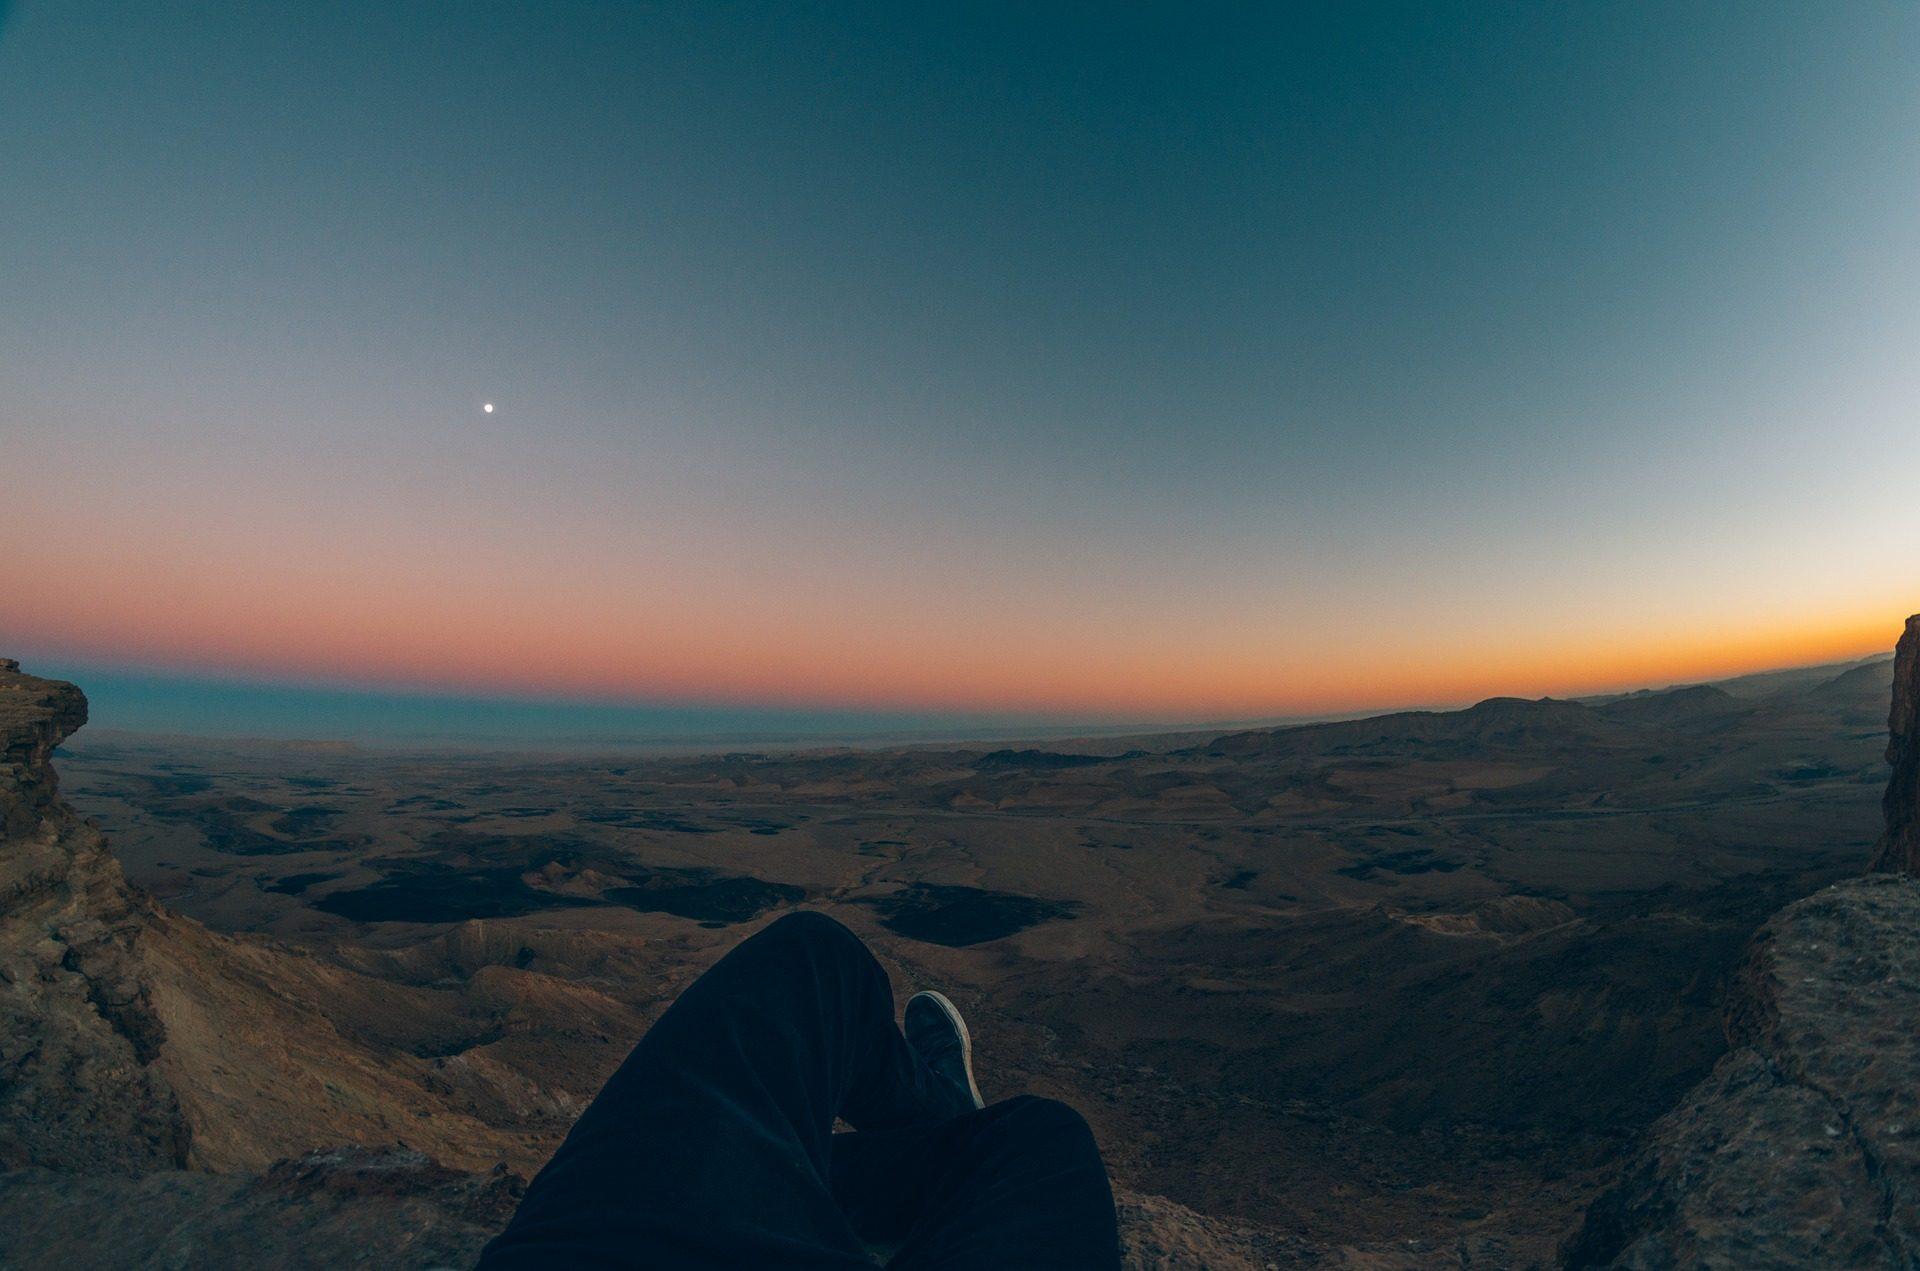 montañas, horizonte, alturas, cielo, atardecer, luna - Fondos de Pantalla HD - professor-falken.com